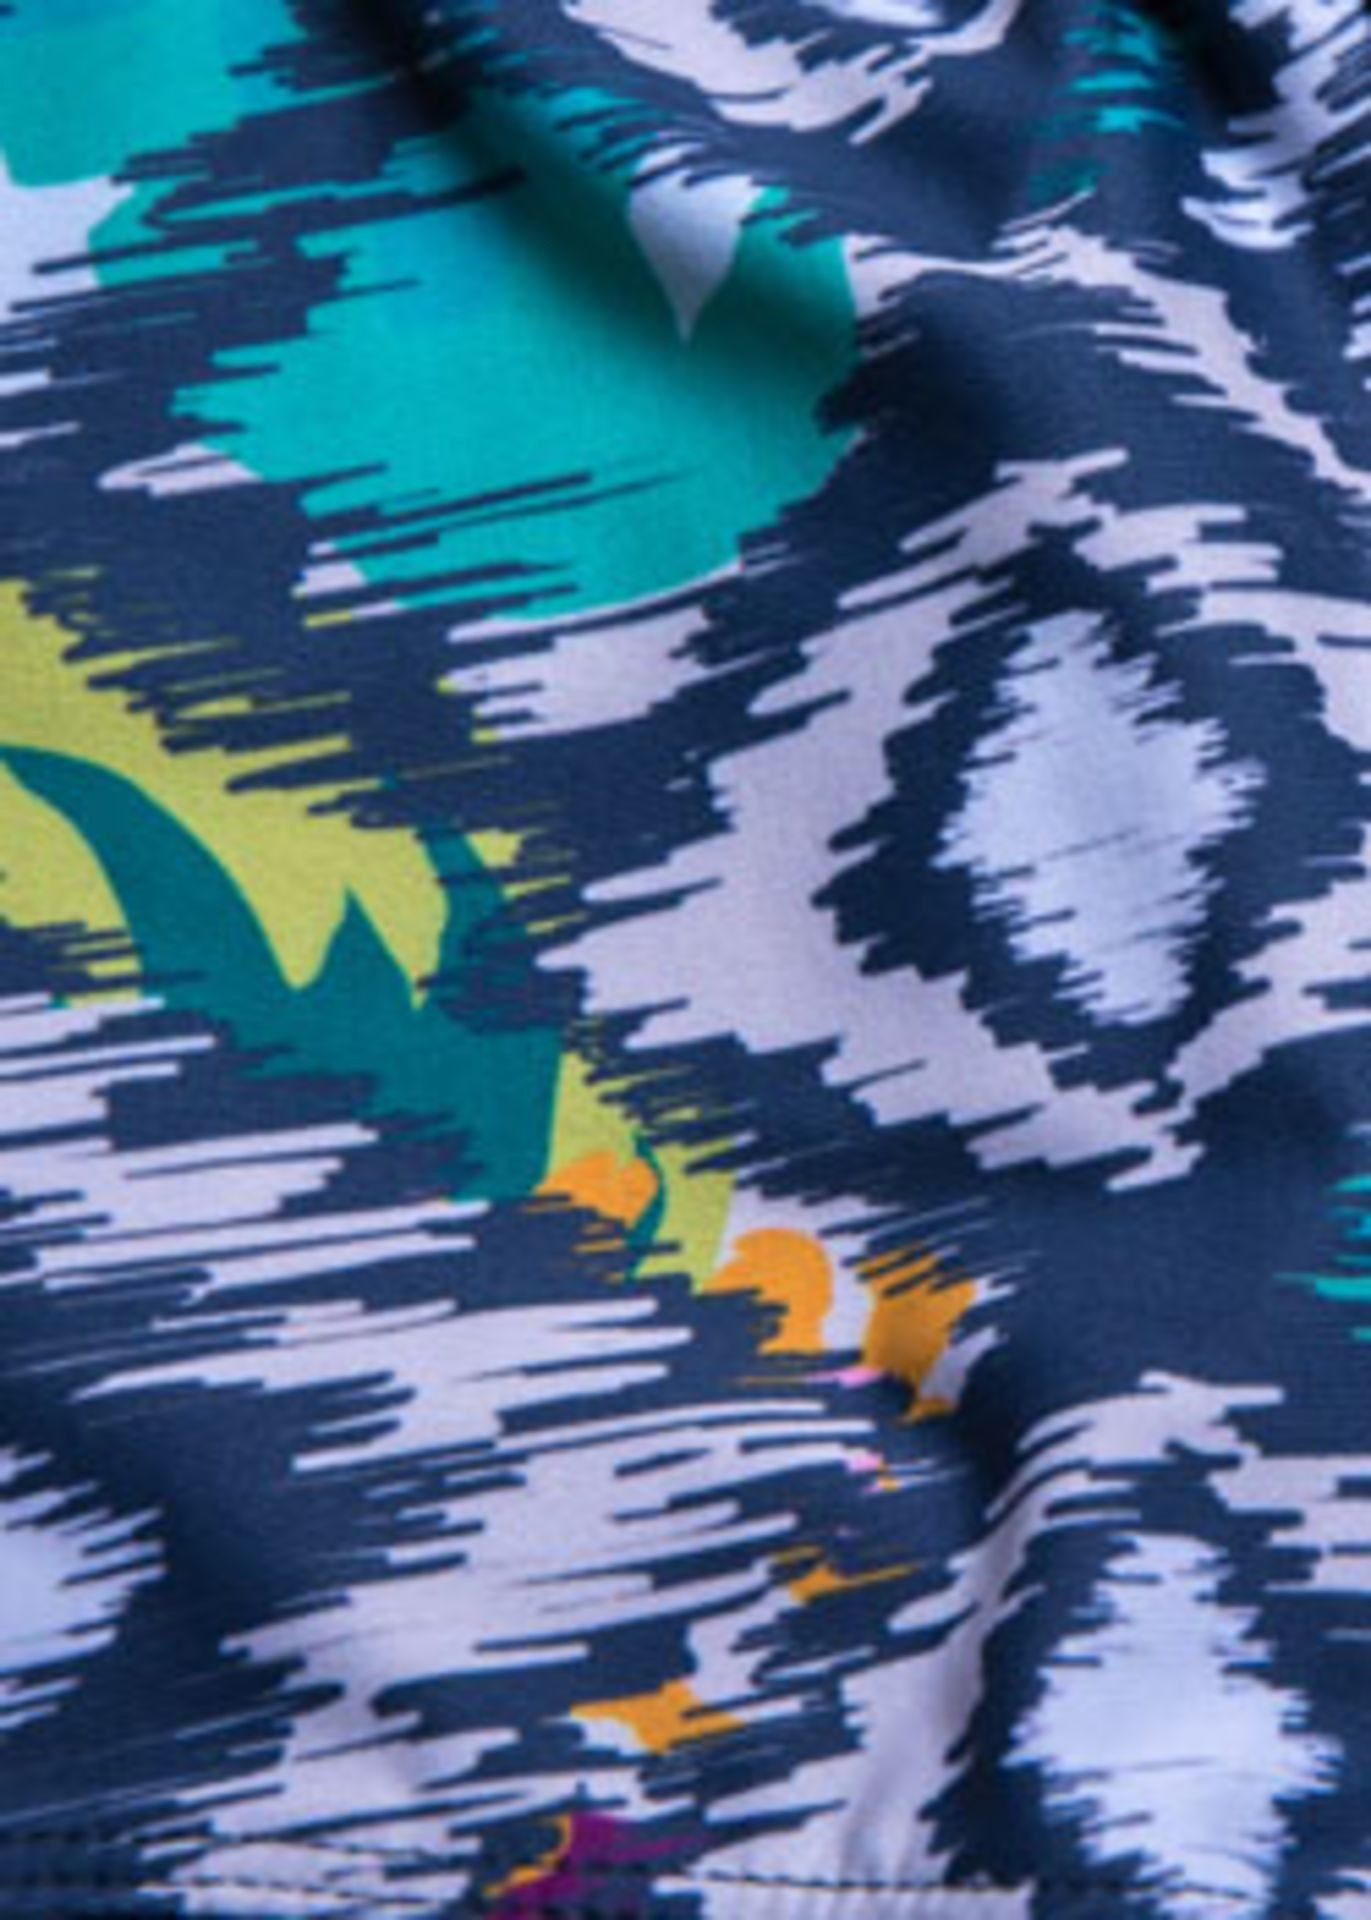 4 x Paraqeet Print Leggings | XS | 4 Designs - Image 7 of 8